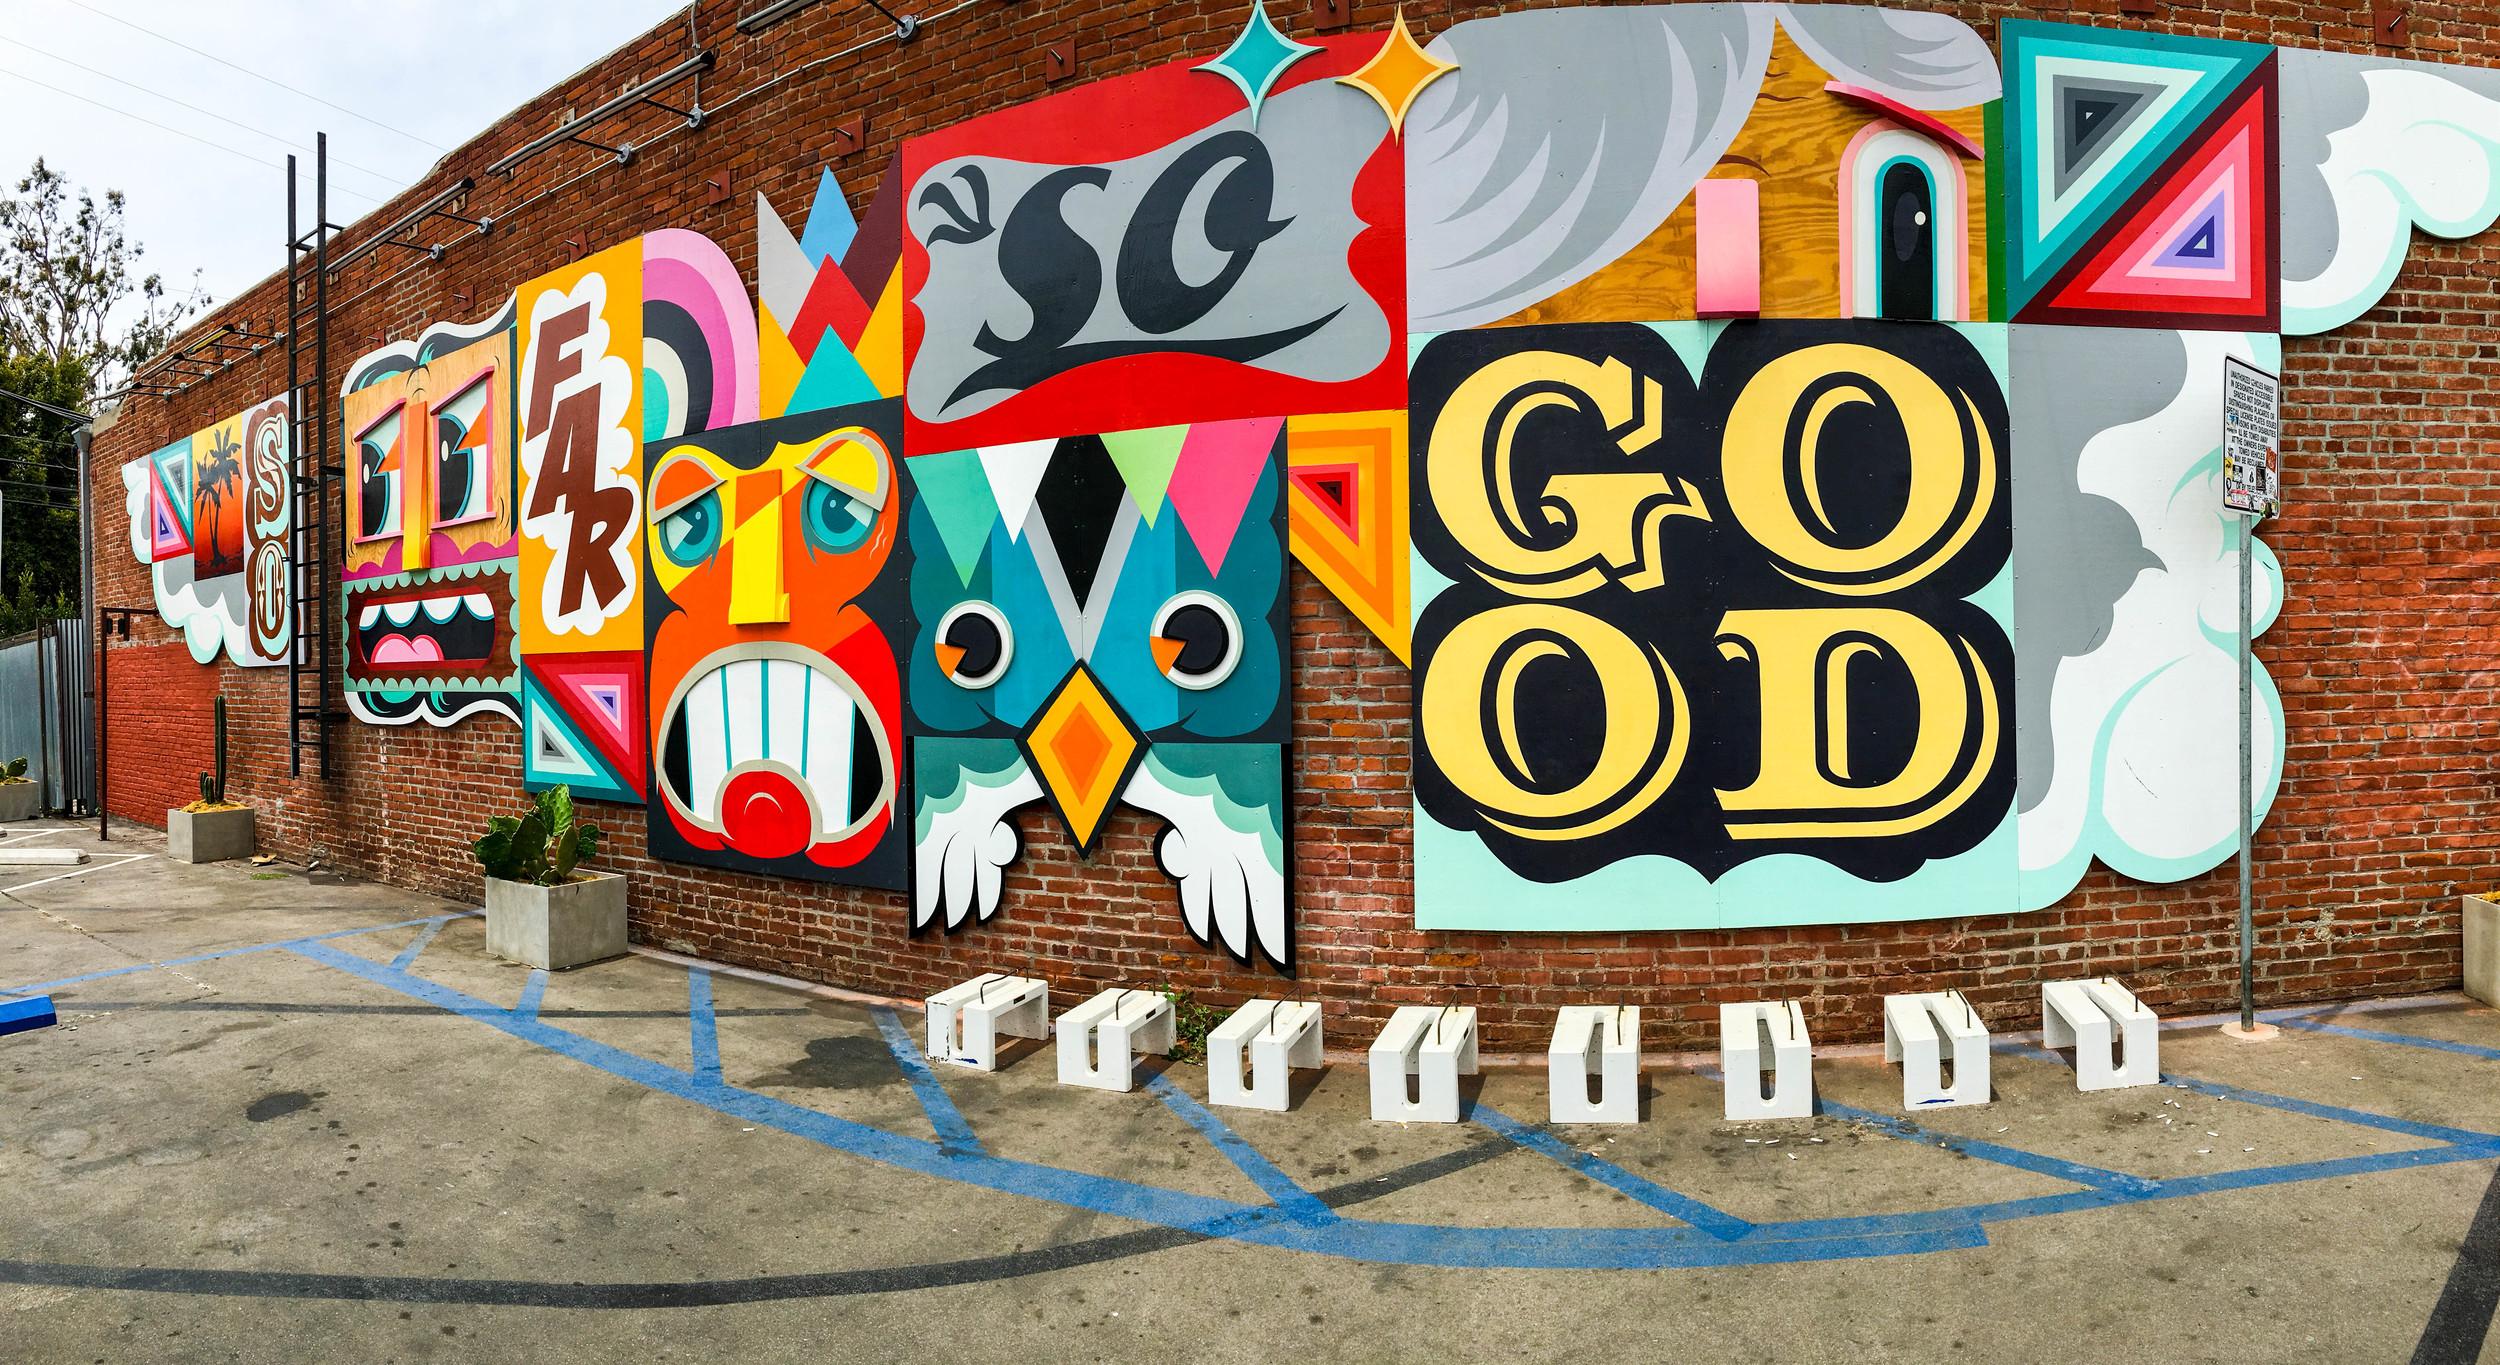 10. Abbot Kinney   Abbot Kinney Blvd, Los Angeles, CA 90291